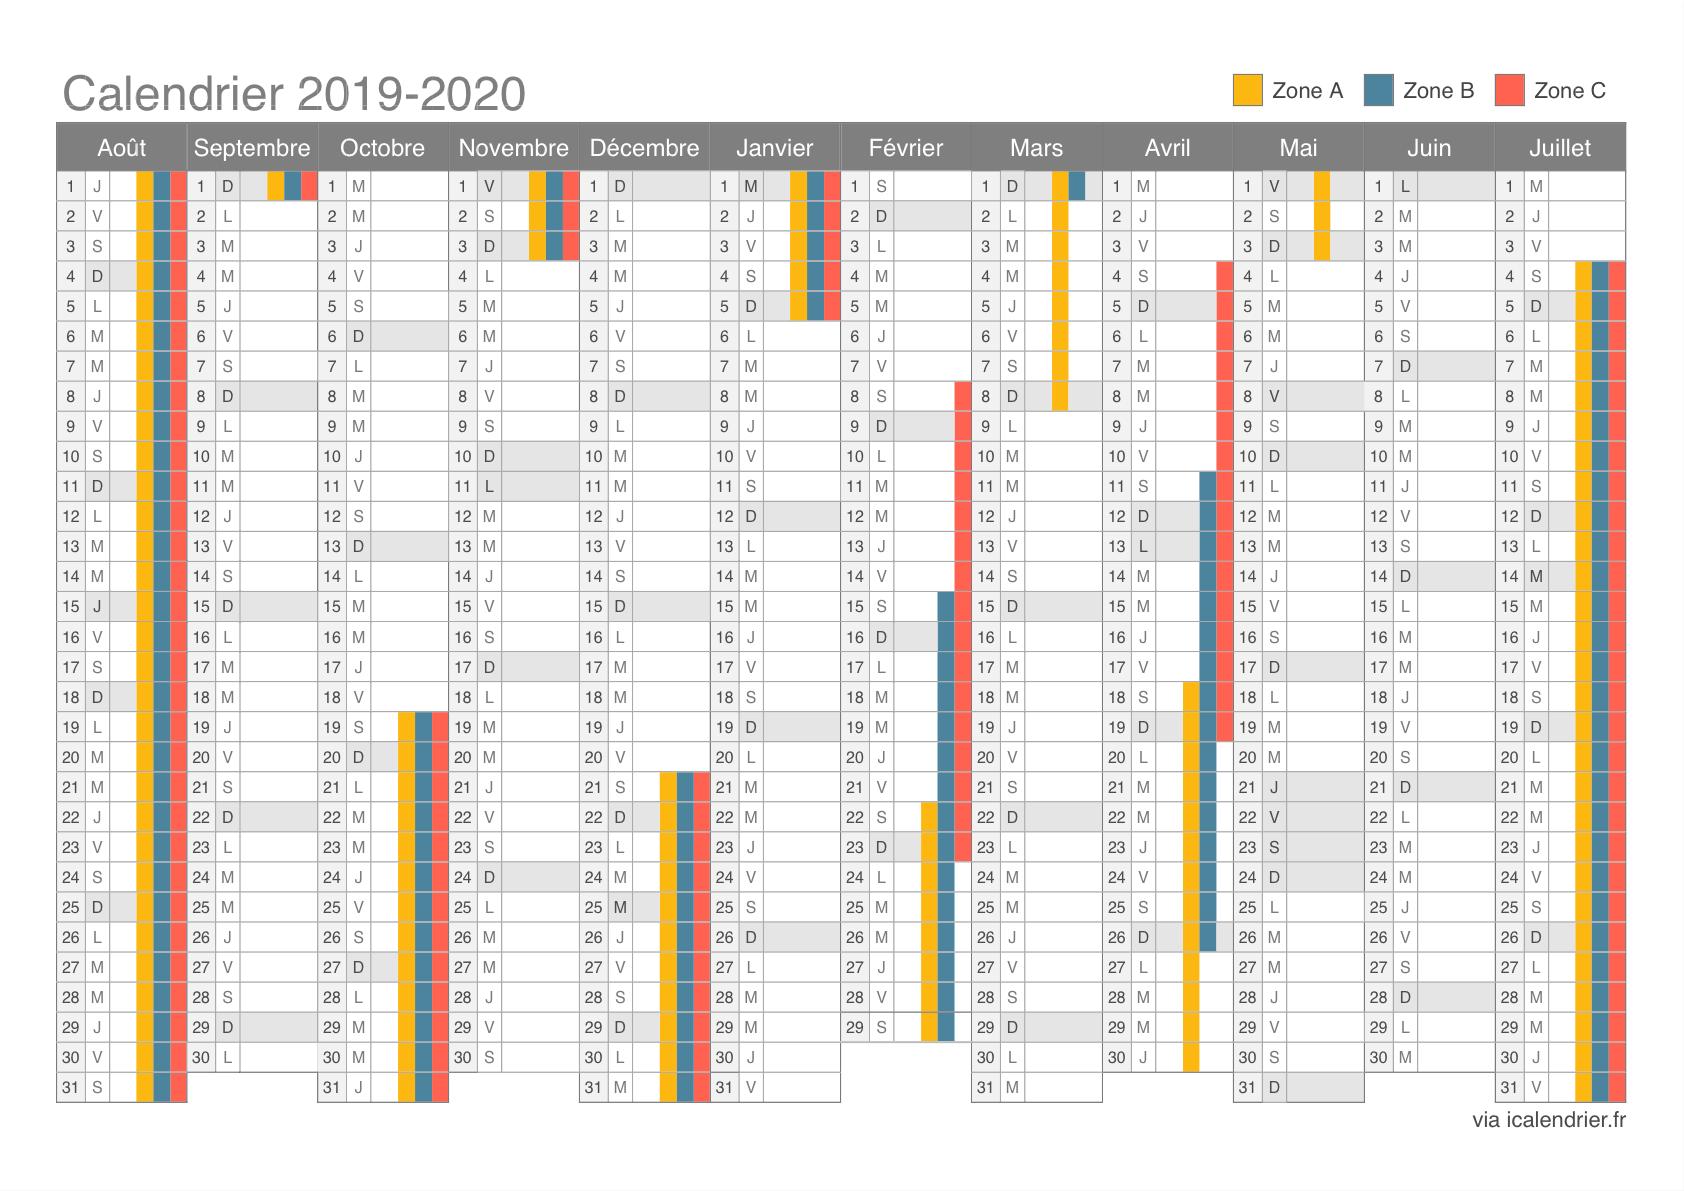 calendrier-vacances-2019-2020